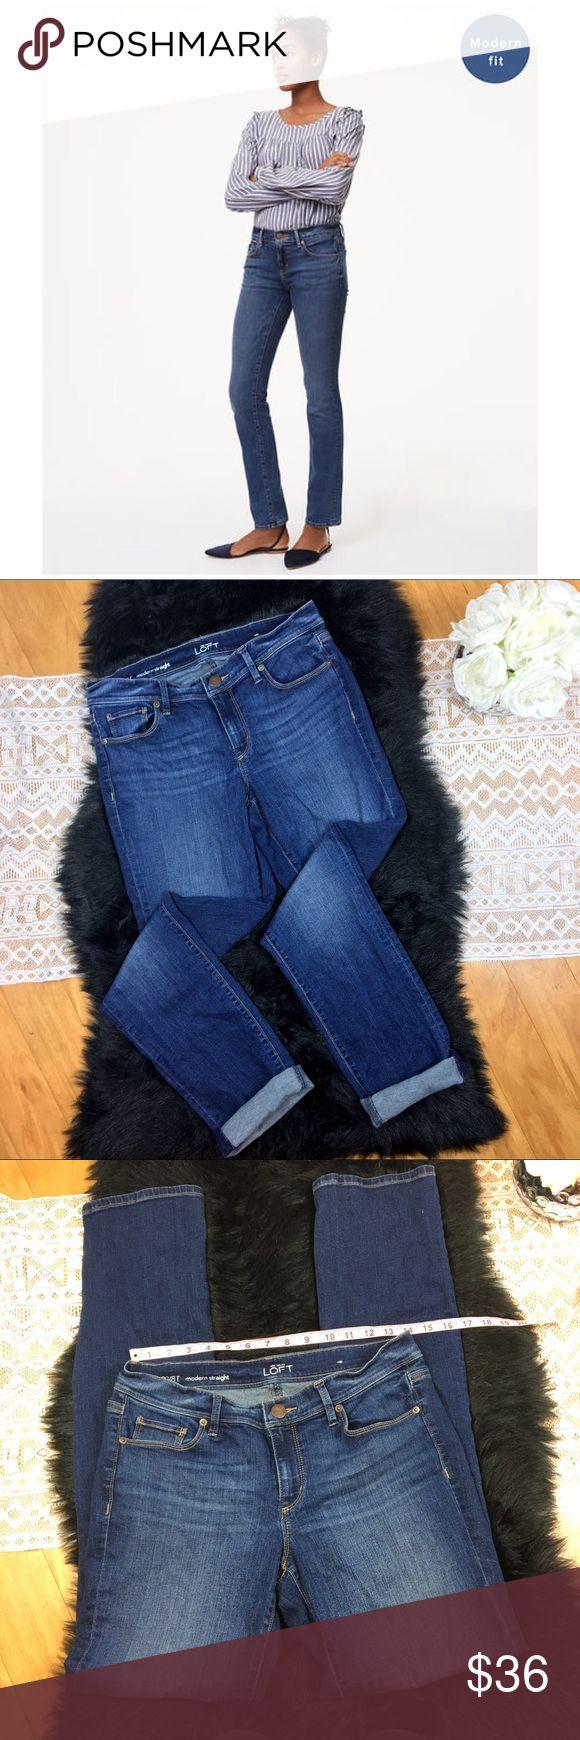 LOFT Modern Straight Tall Jeans LOFT Modern Straight Tall Jeans. Size 29/8 tall with 33' inseam and 8' rise. Has good amount of stretch. Good used condition. LOFT Jeans Straight Leg